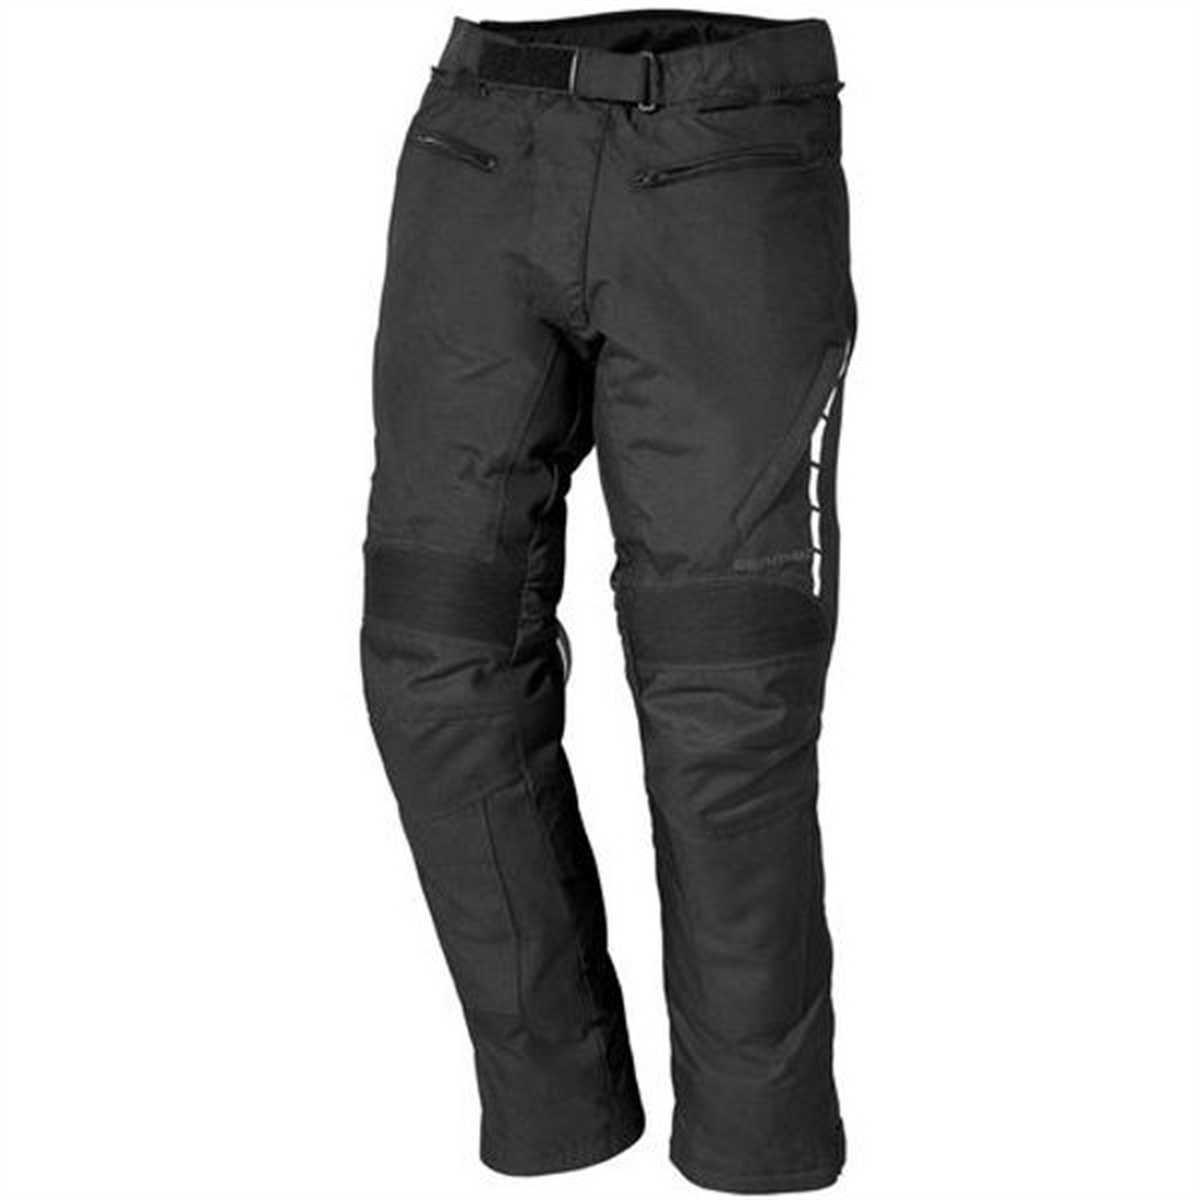 Farbe schwarz Gr/ö/ße XL Germot Evolution II Textilhose